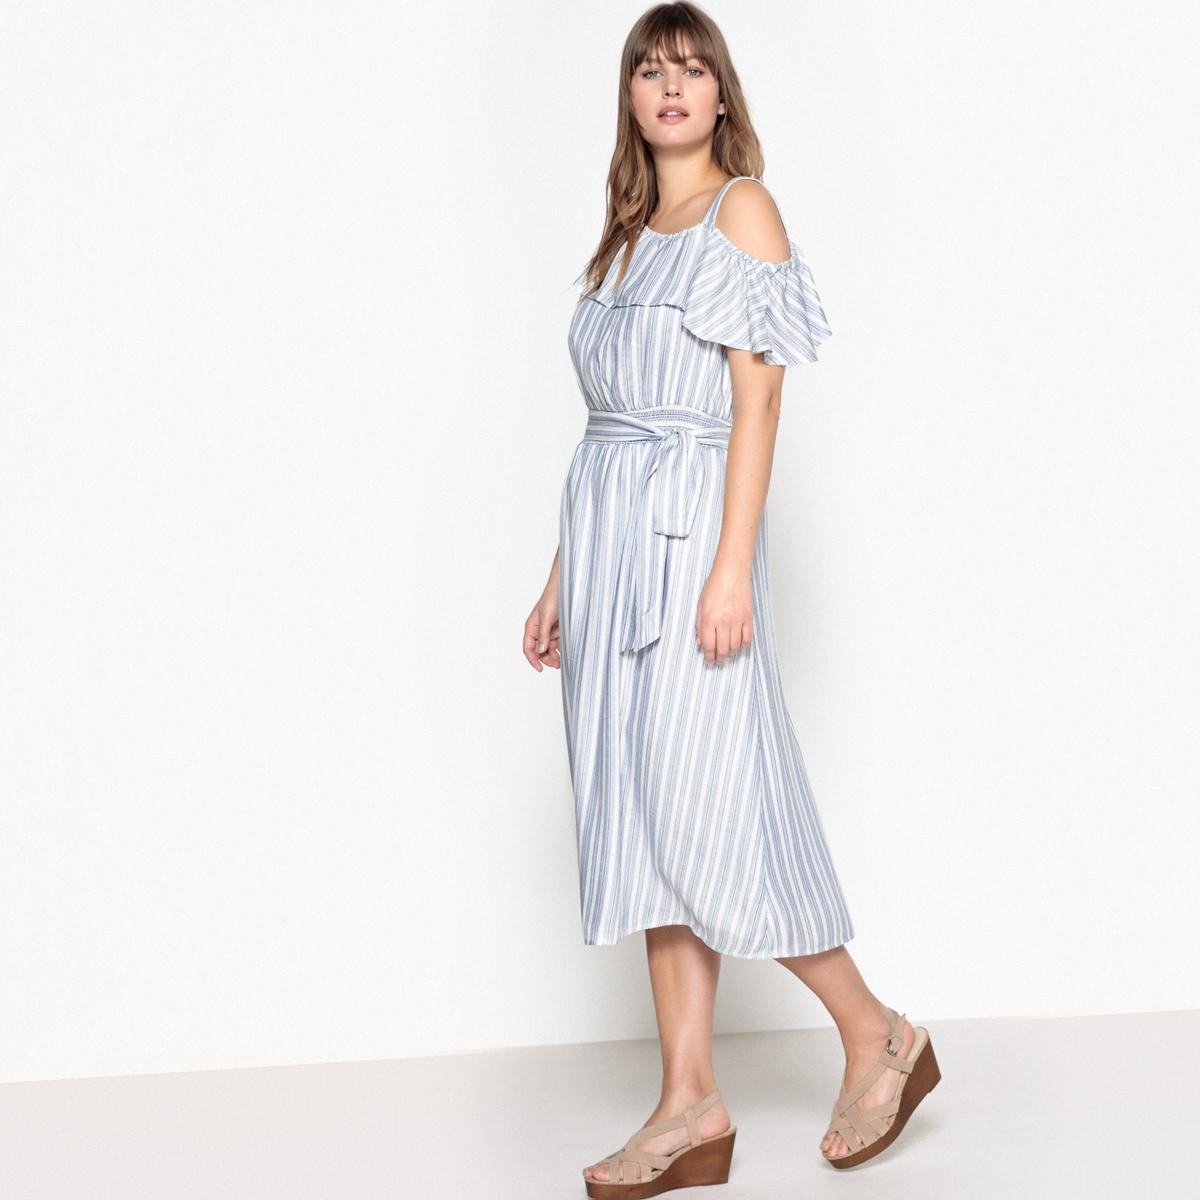 Платье с воланами на груди от La Redoute